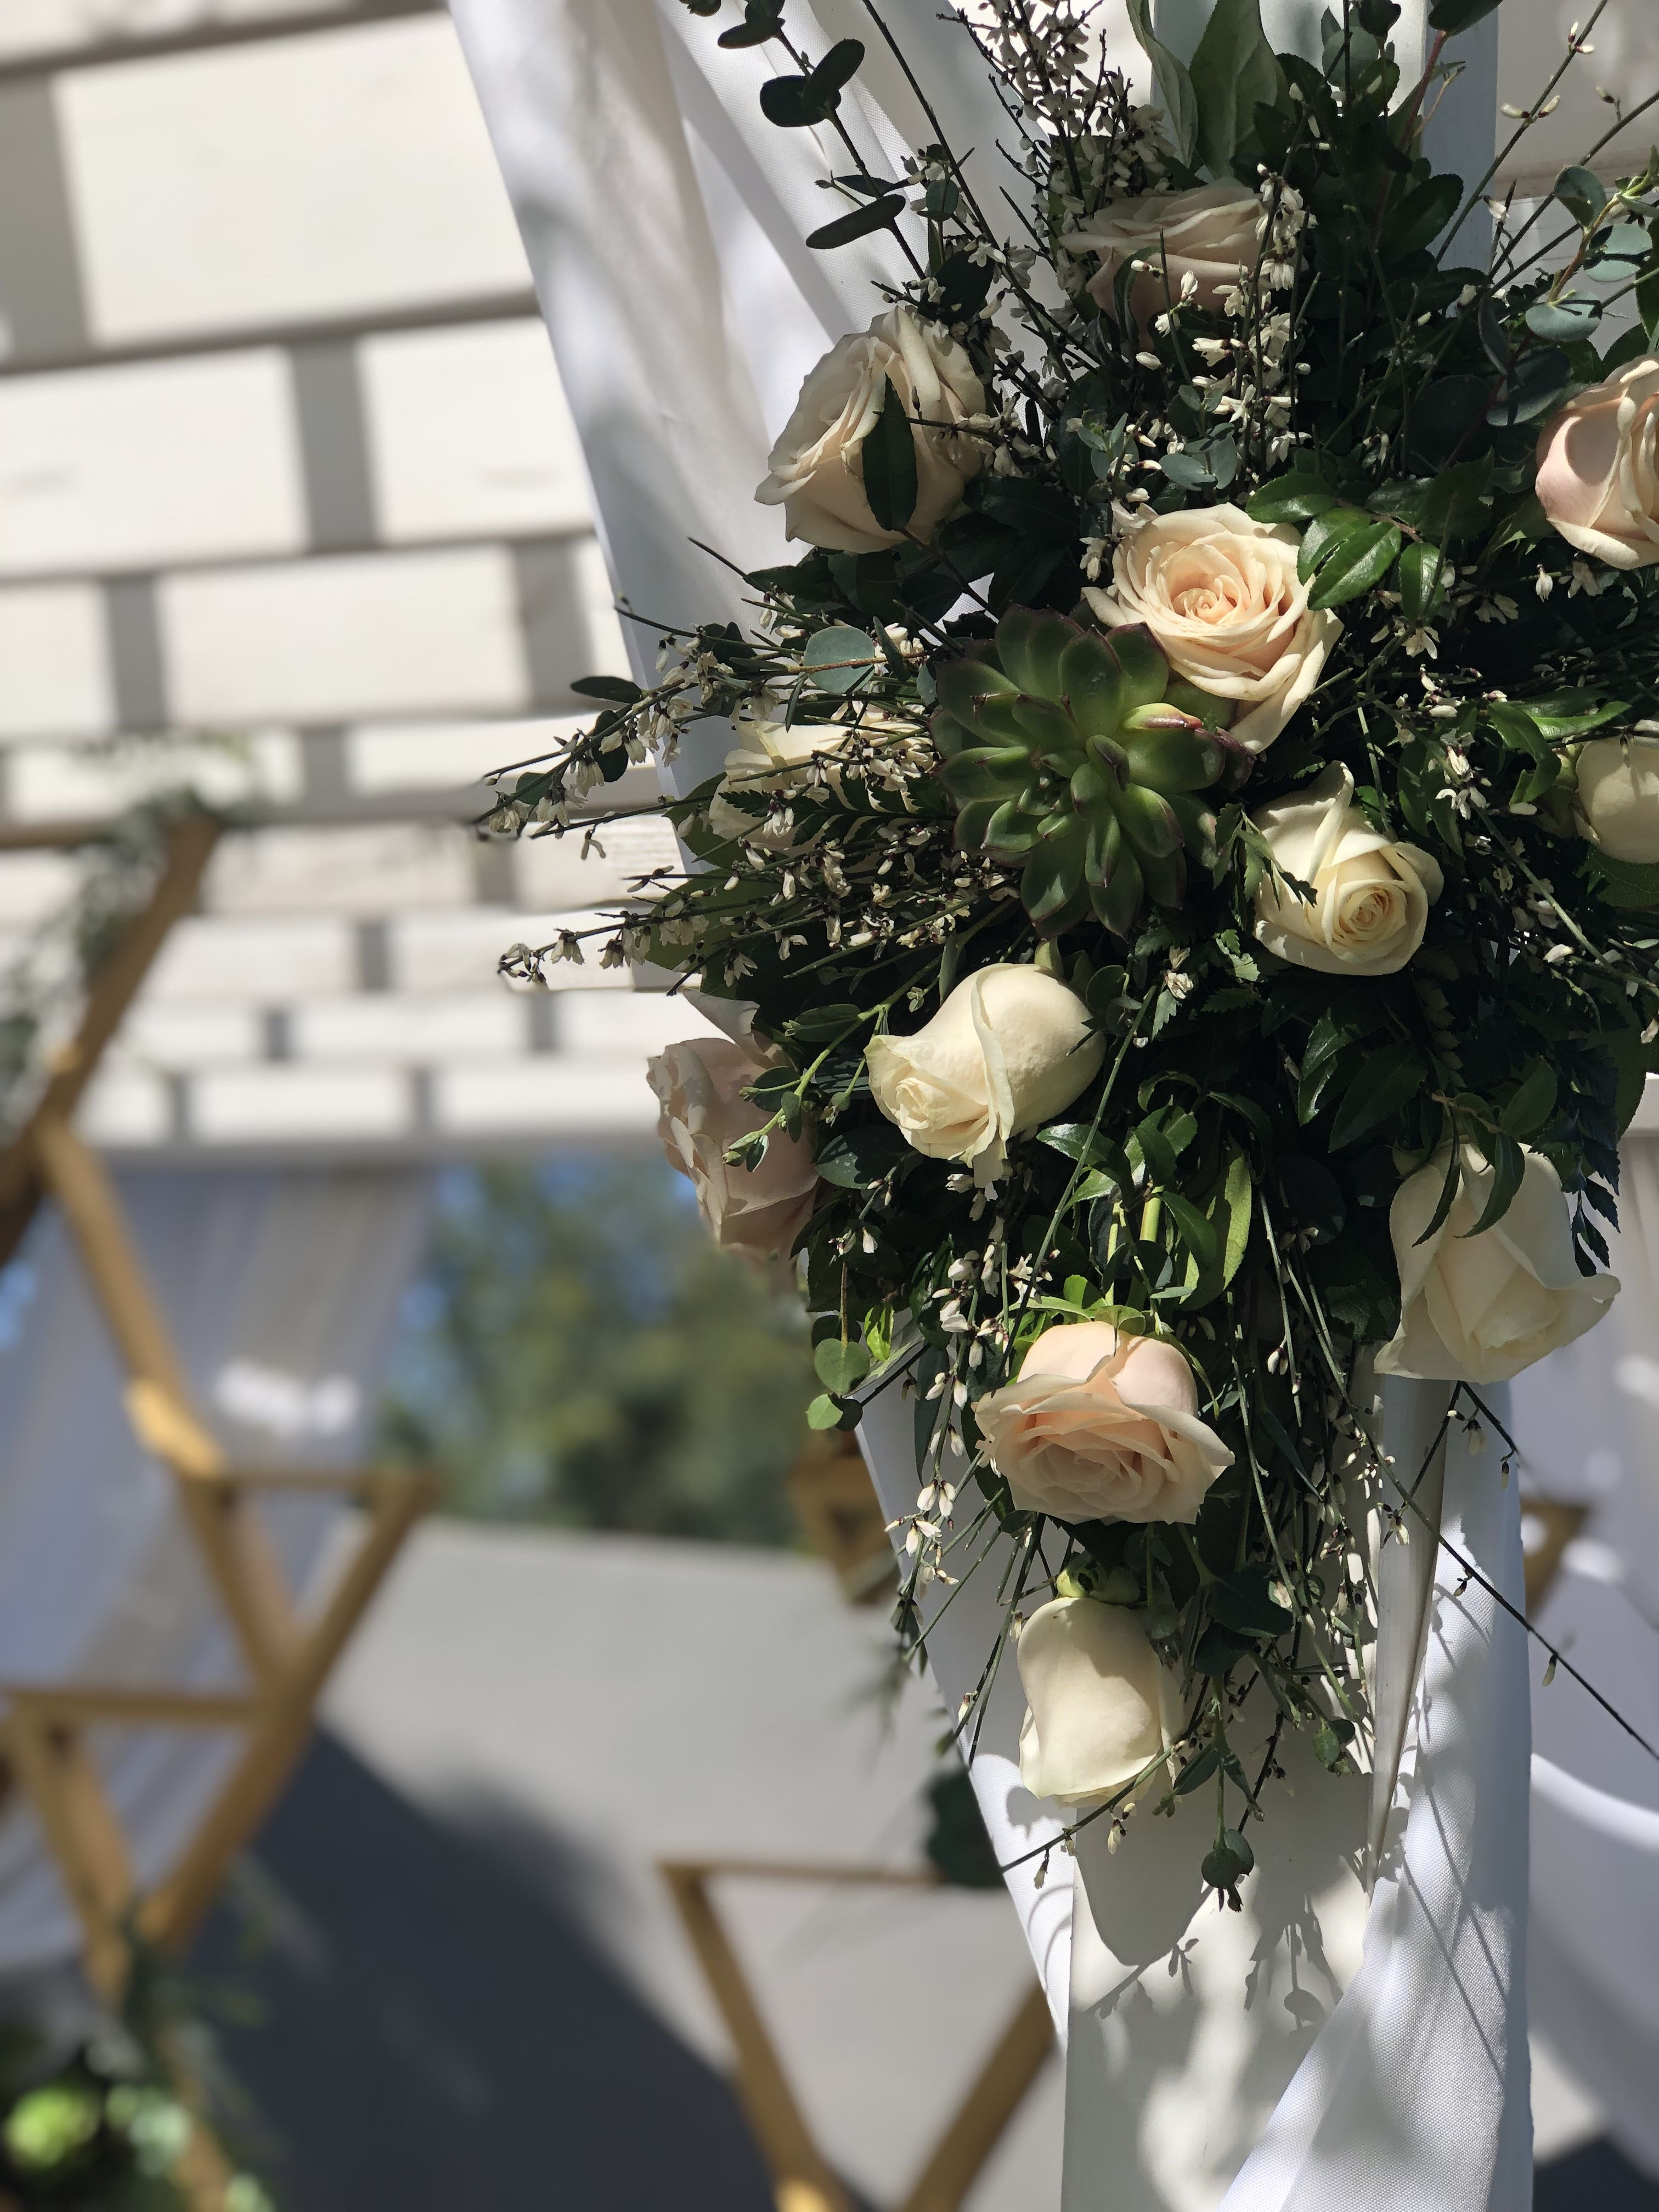 Rustic Wedding Venue in Gilbert AZ - The Cottage Weddings ...